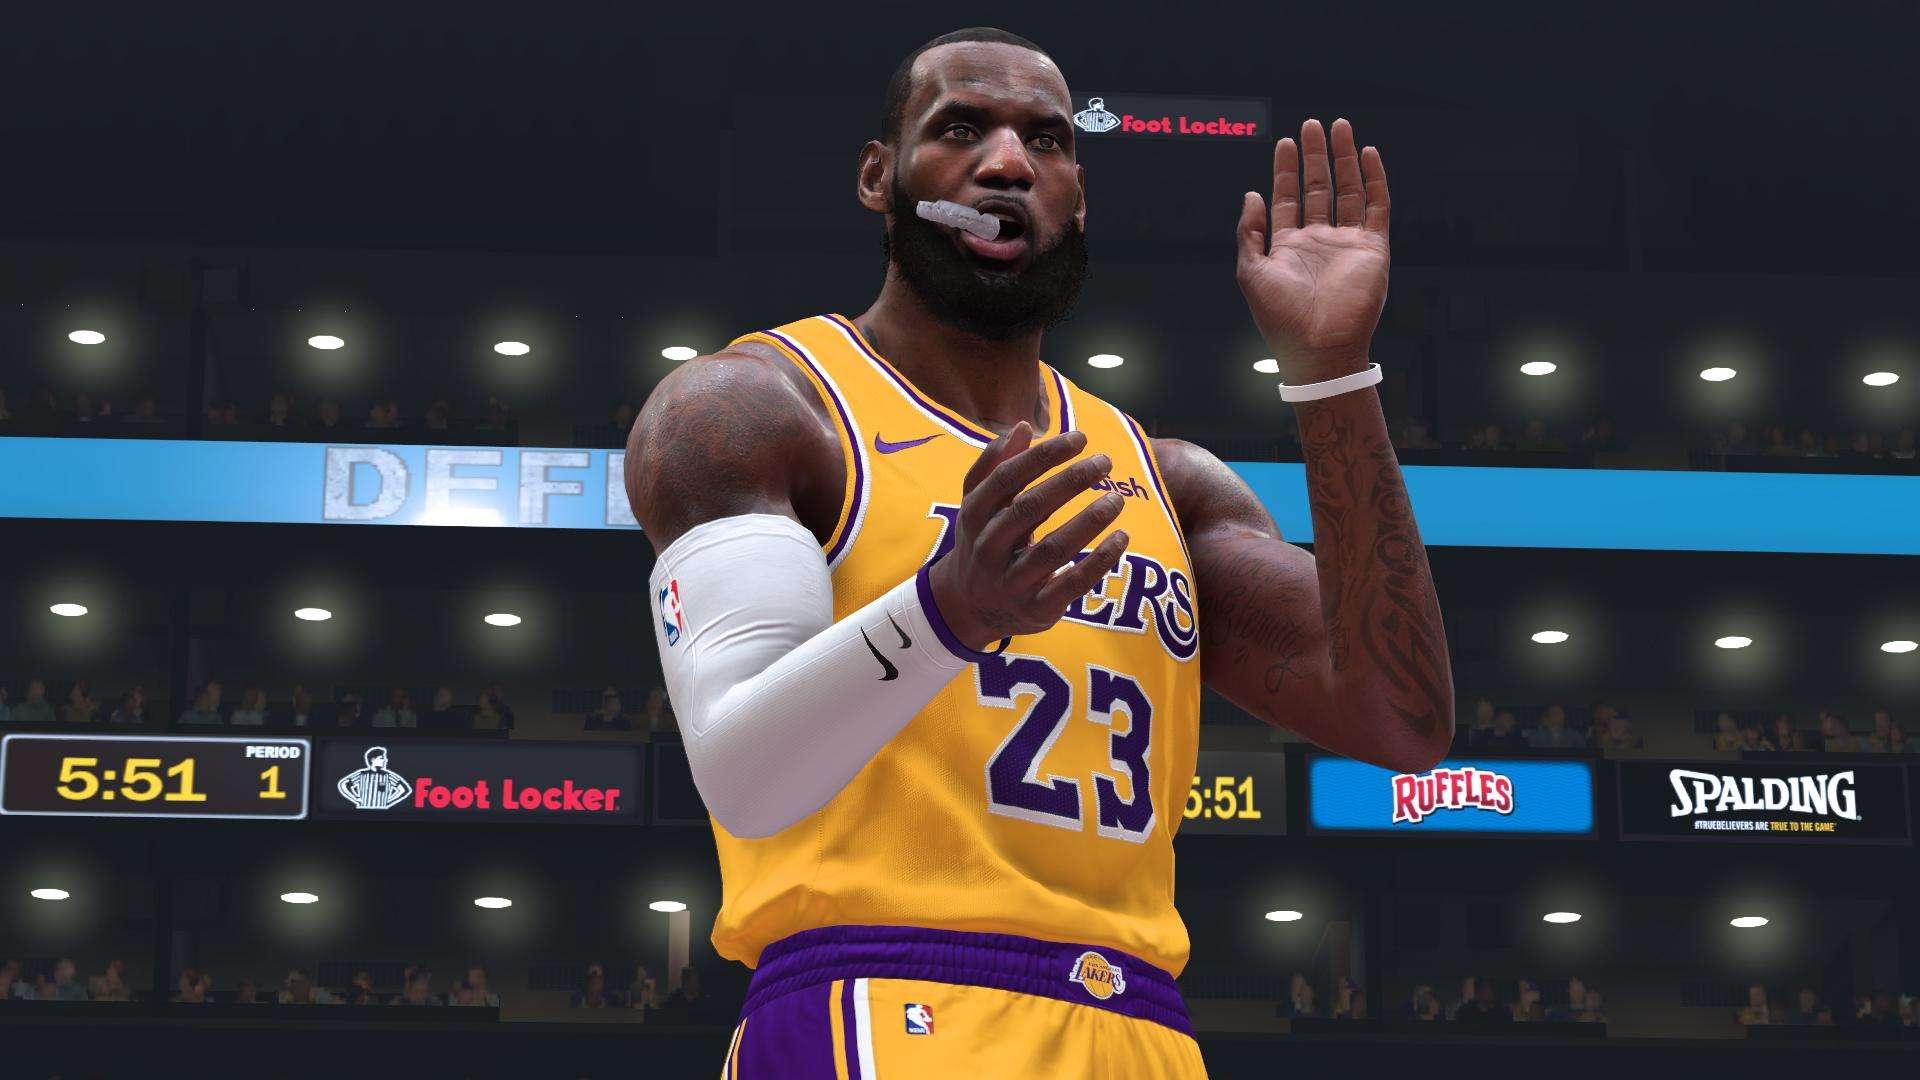 NBA2k20安卓版第5张预览图